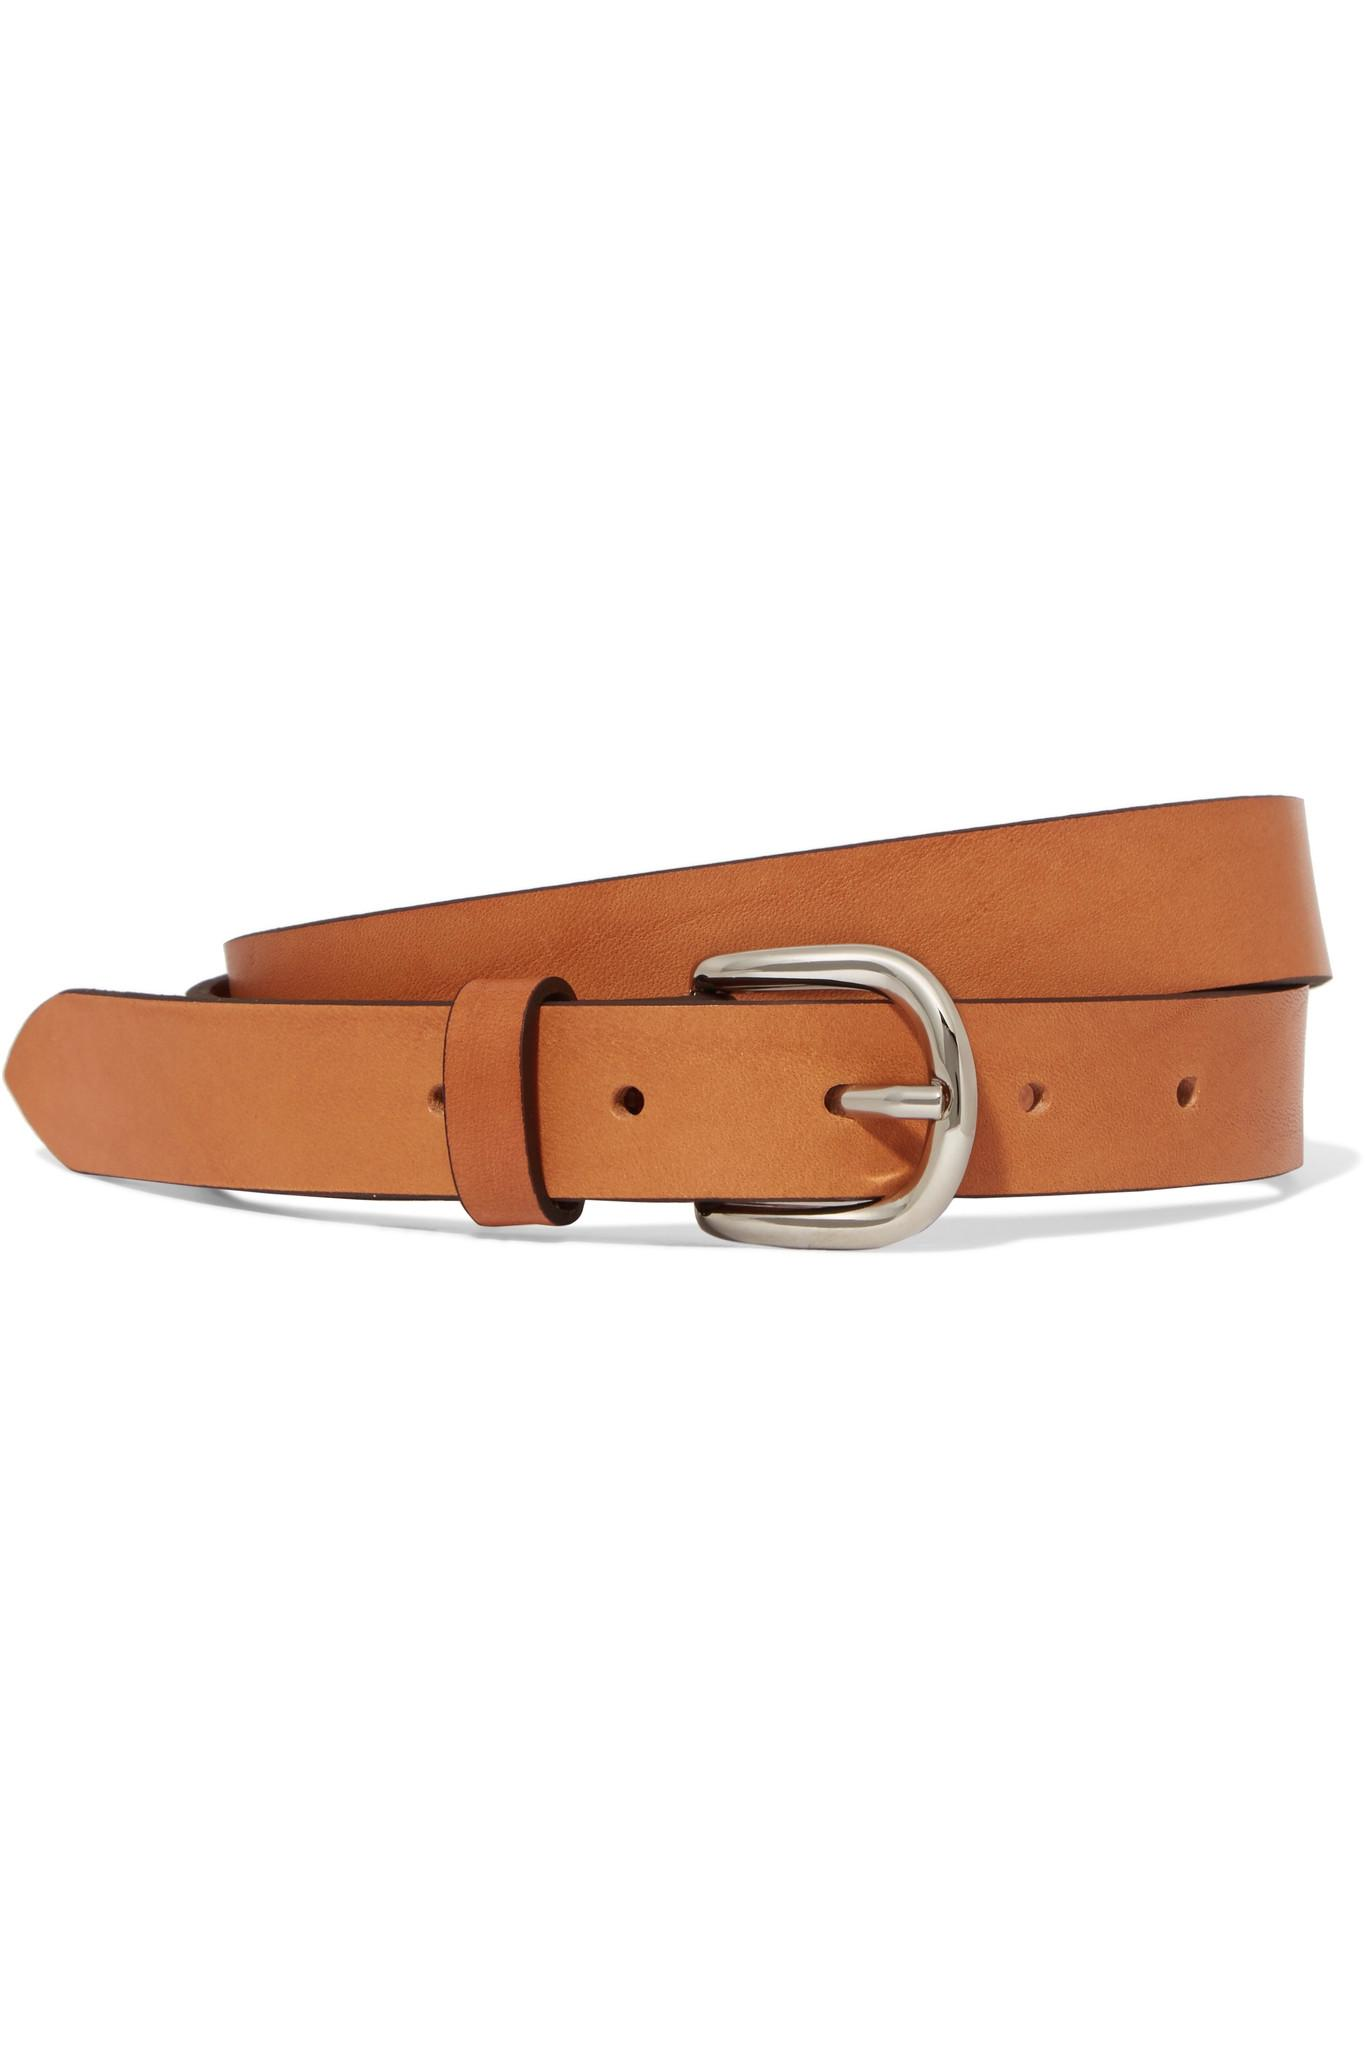 Zap Leather Belt - Burgundy Isabel Marant VcLVFvGG